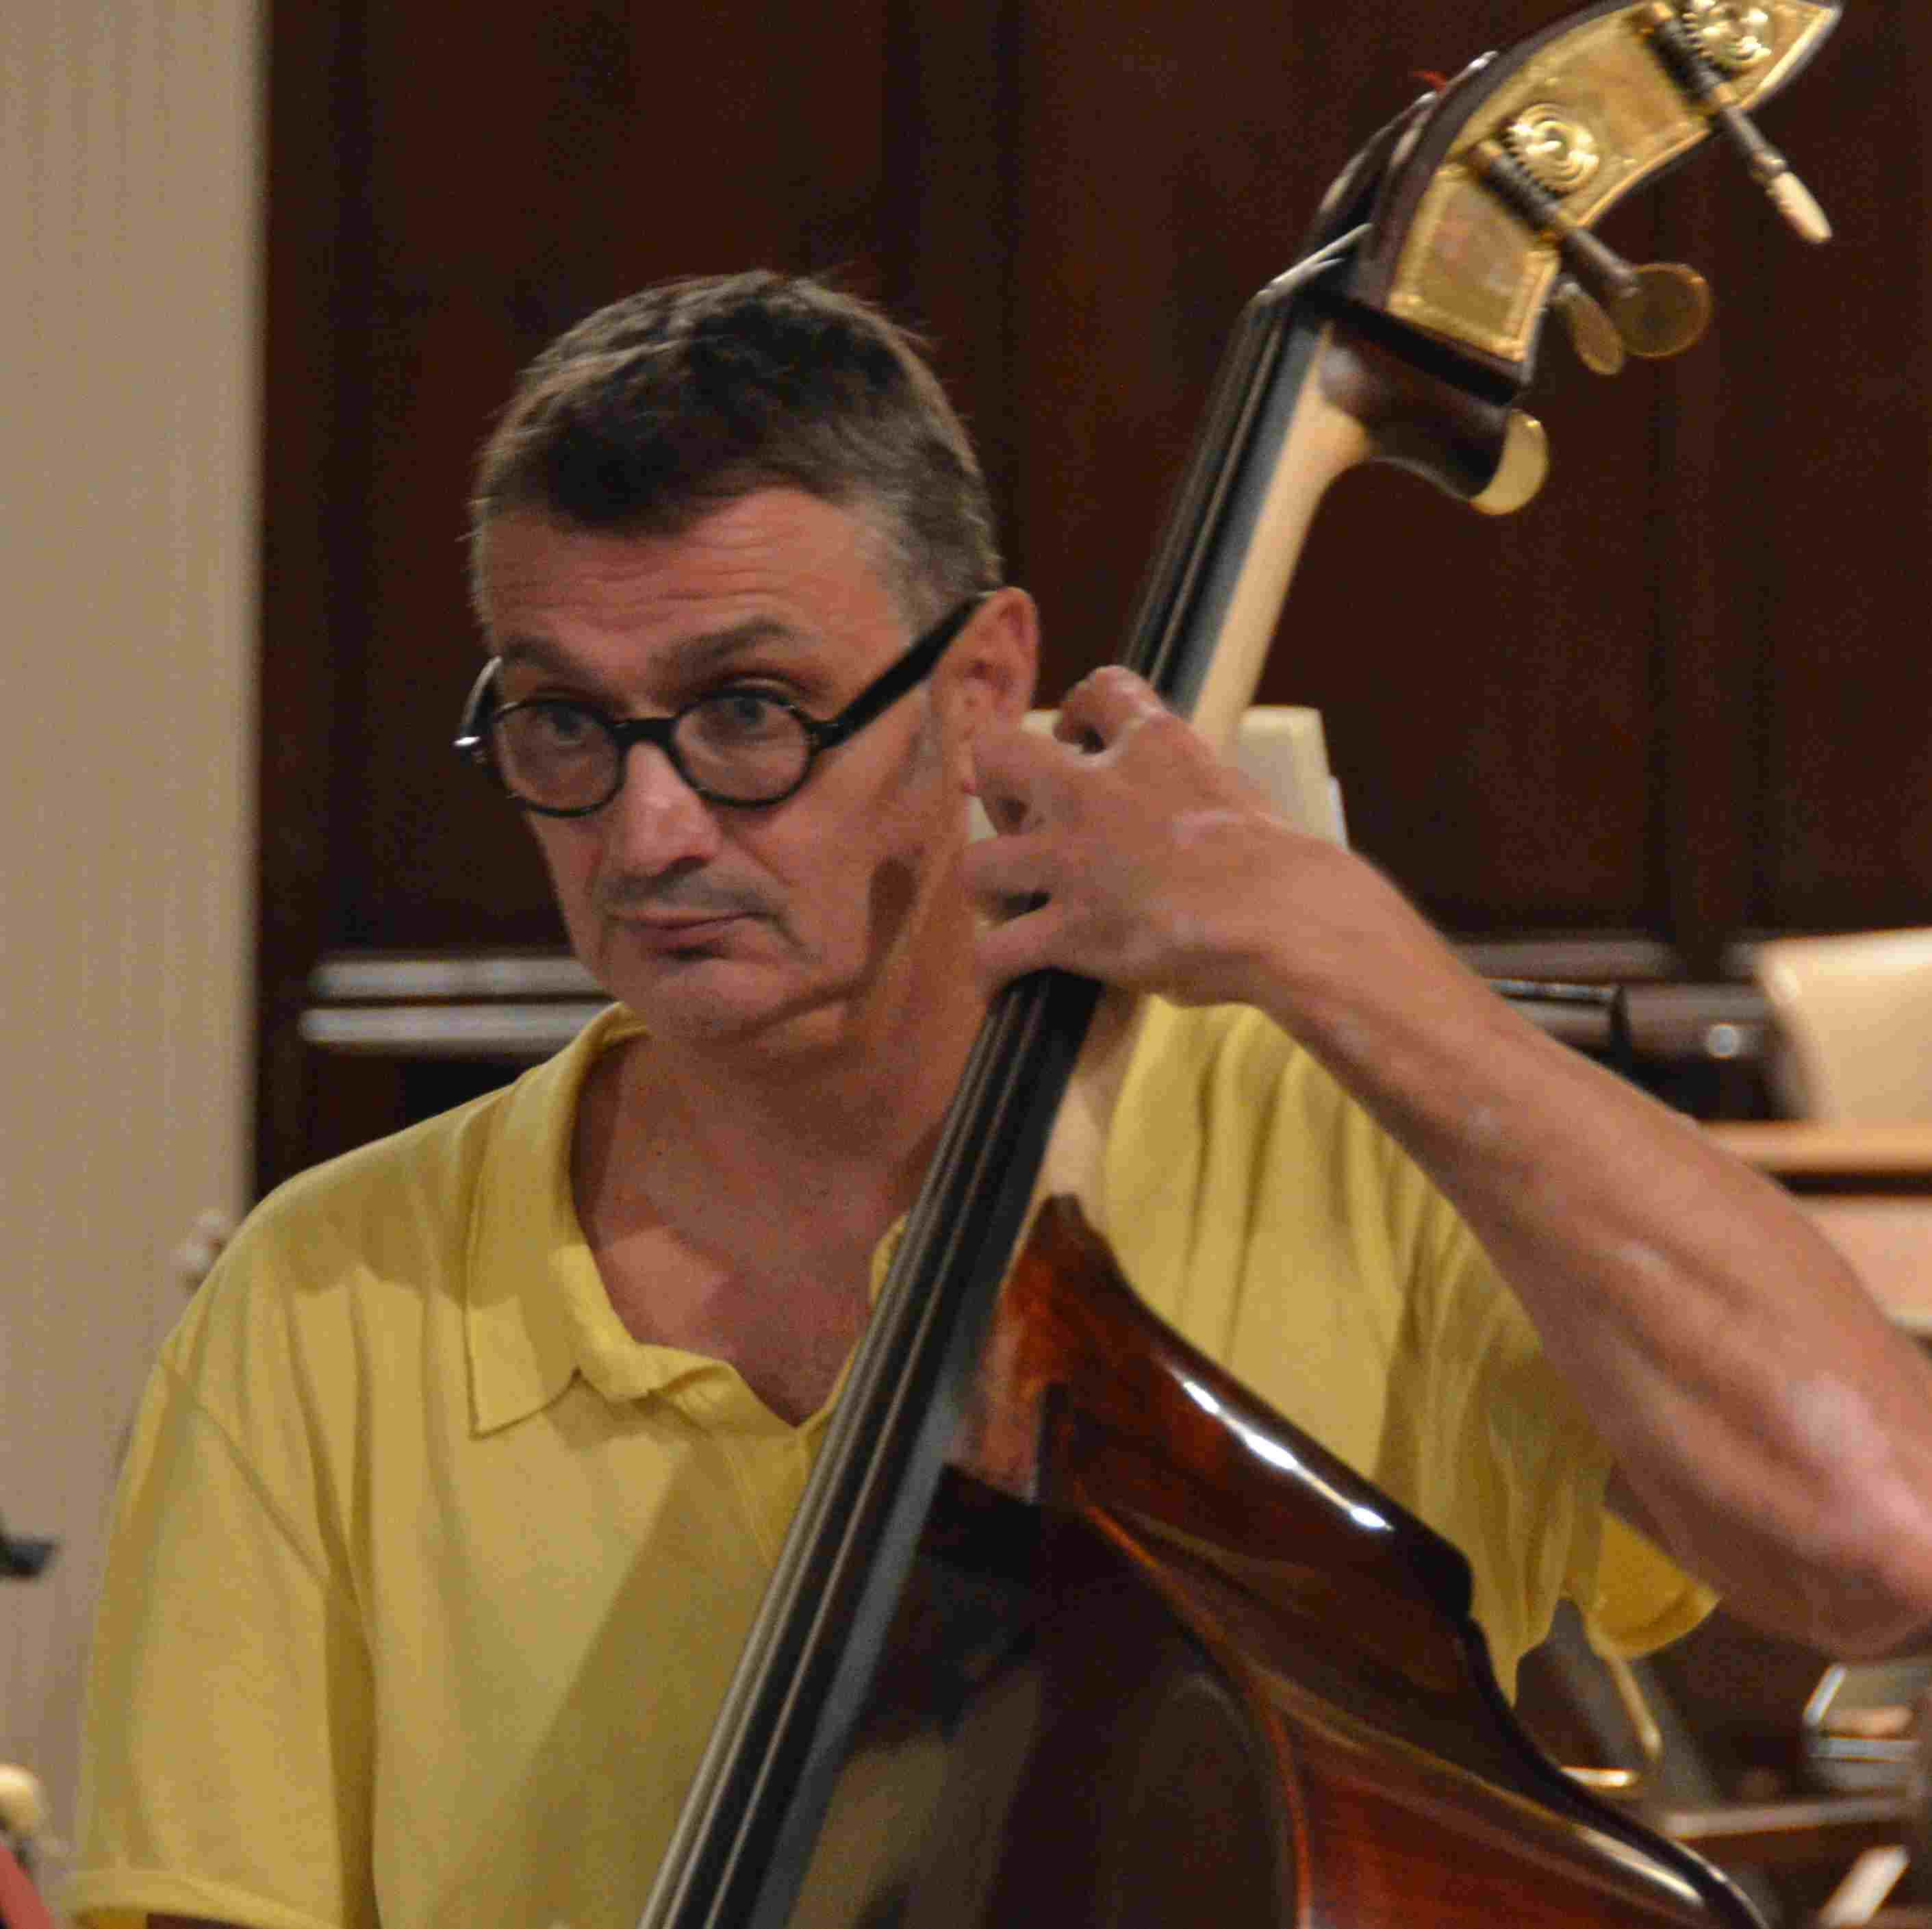 Patrick LAFROGNE - contrebasse